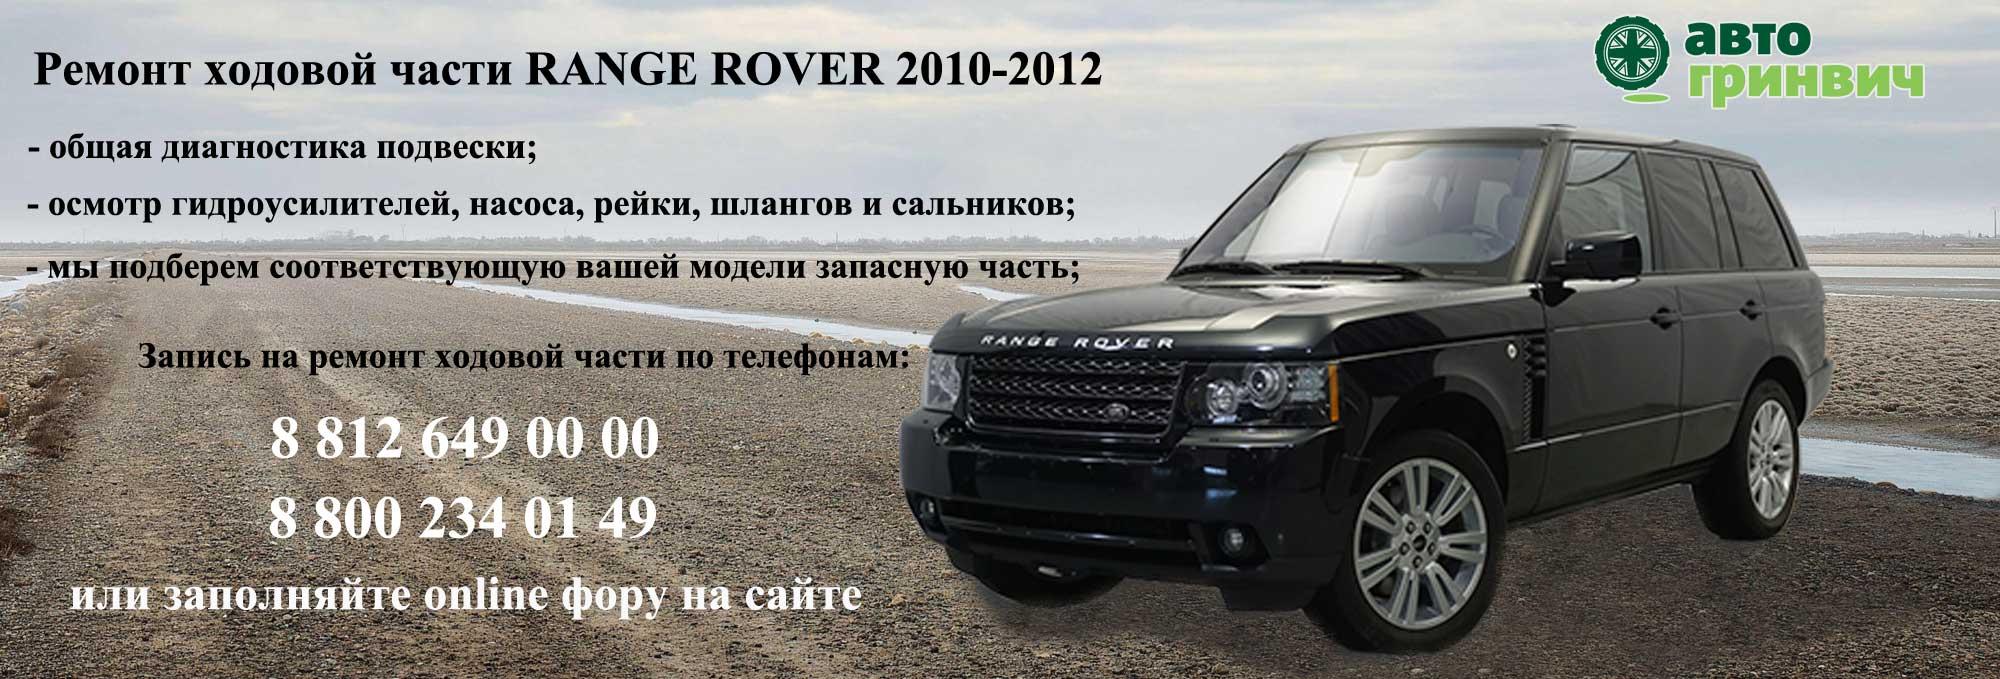 Ремонт ходовой части Range Rover 2010-2012